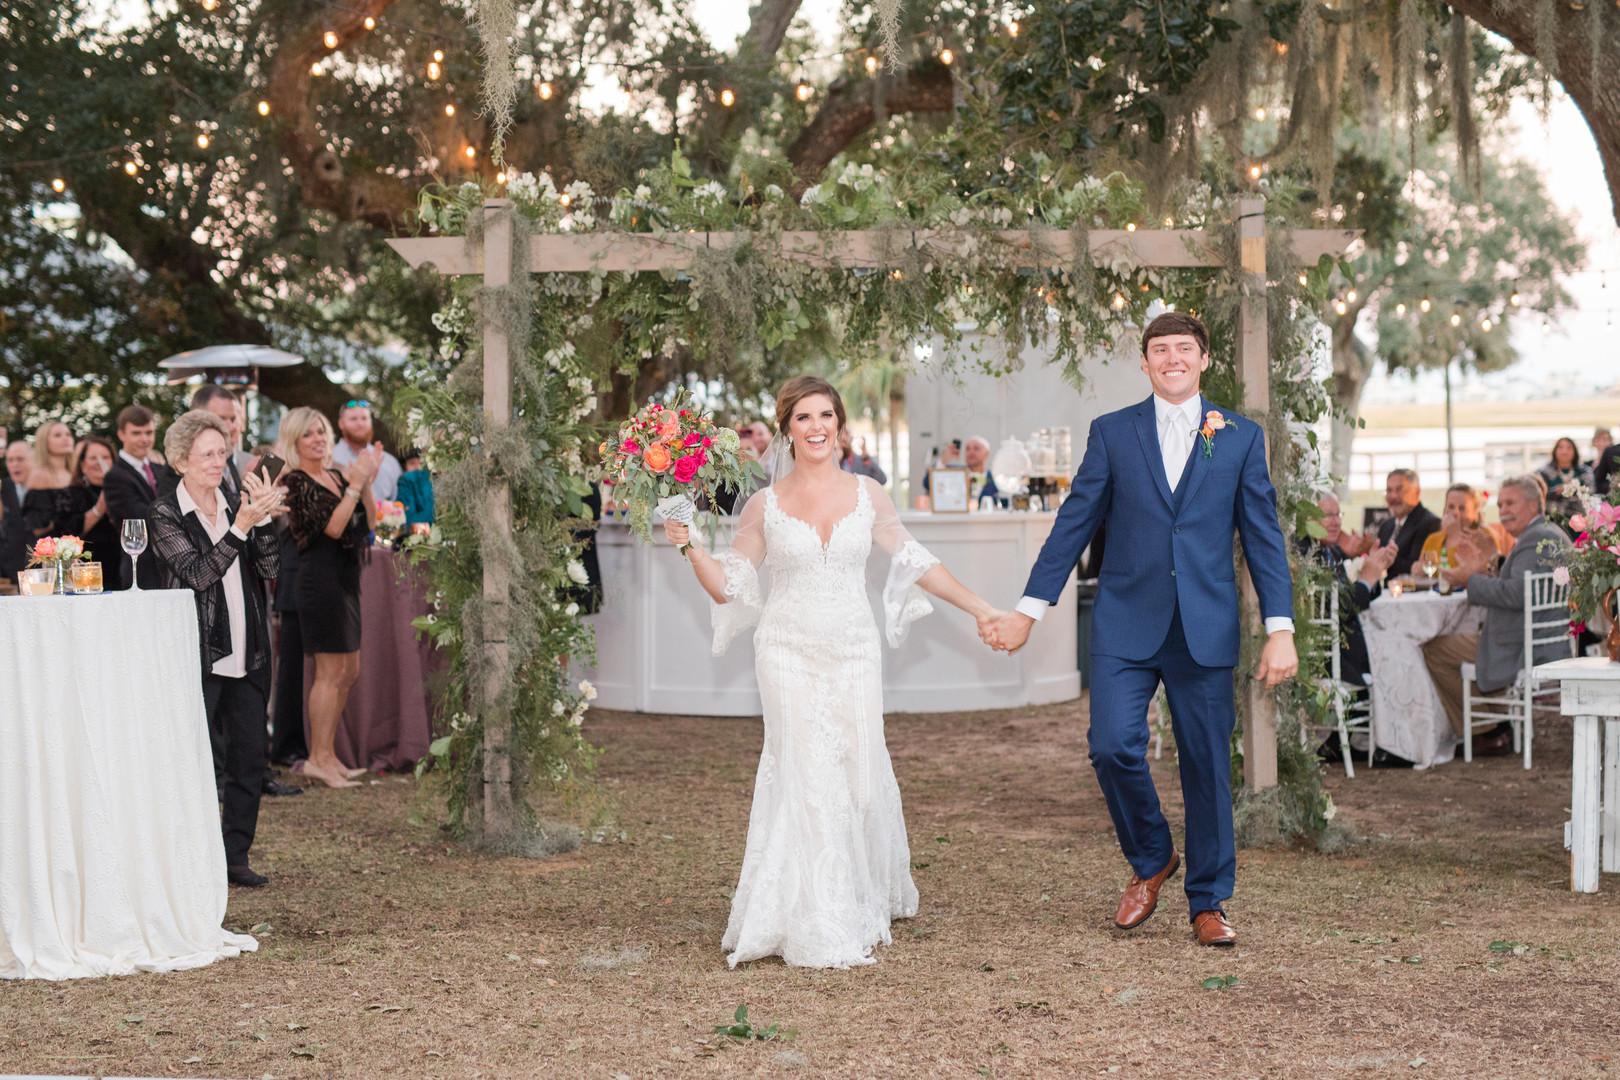 sunnyside-plantation-wedding-36.jpg